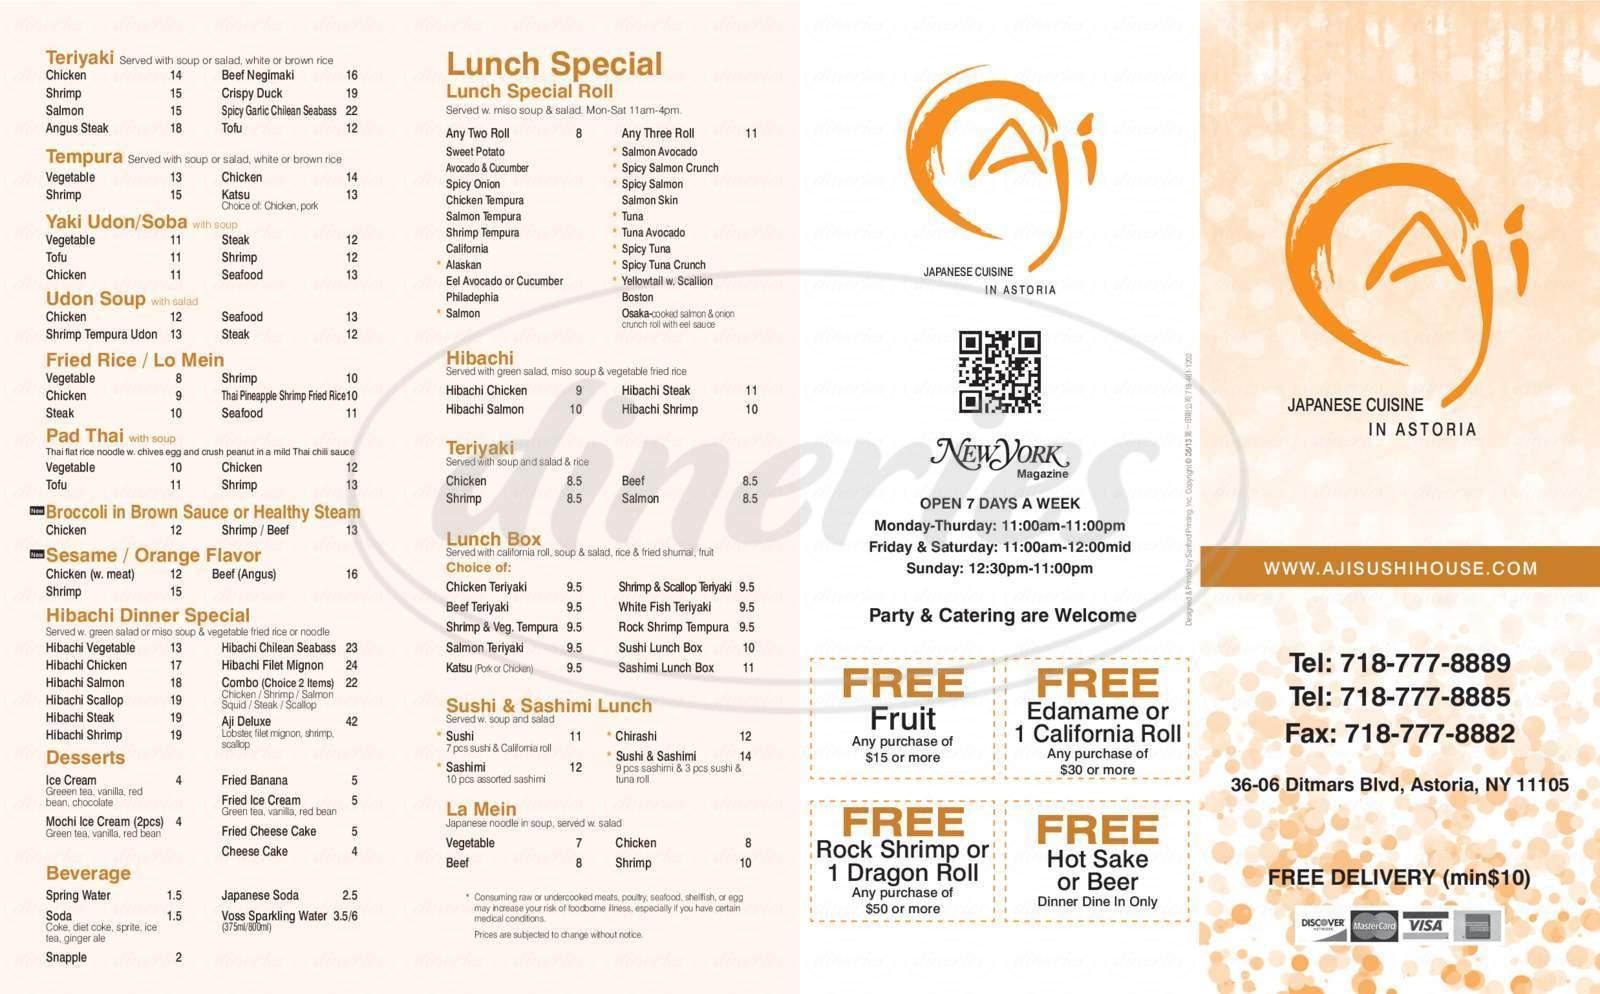 menu for Aji Sushi House